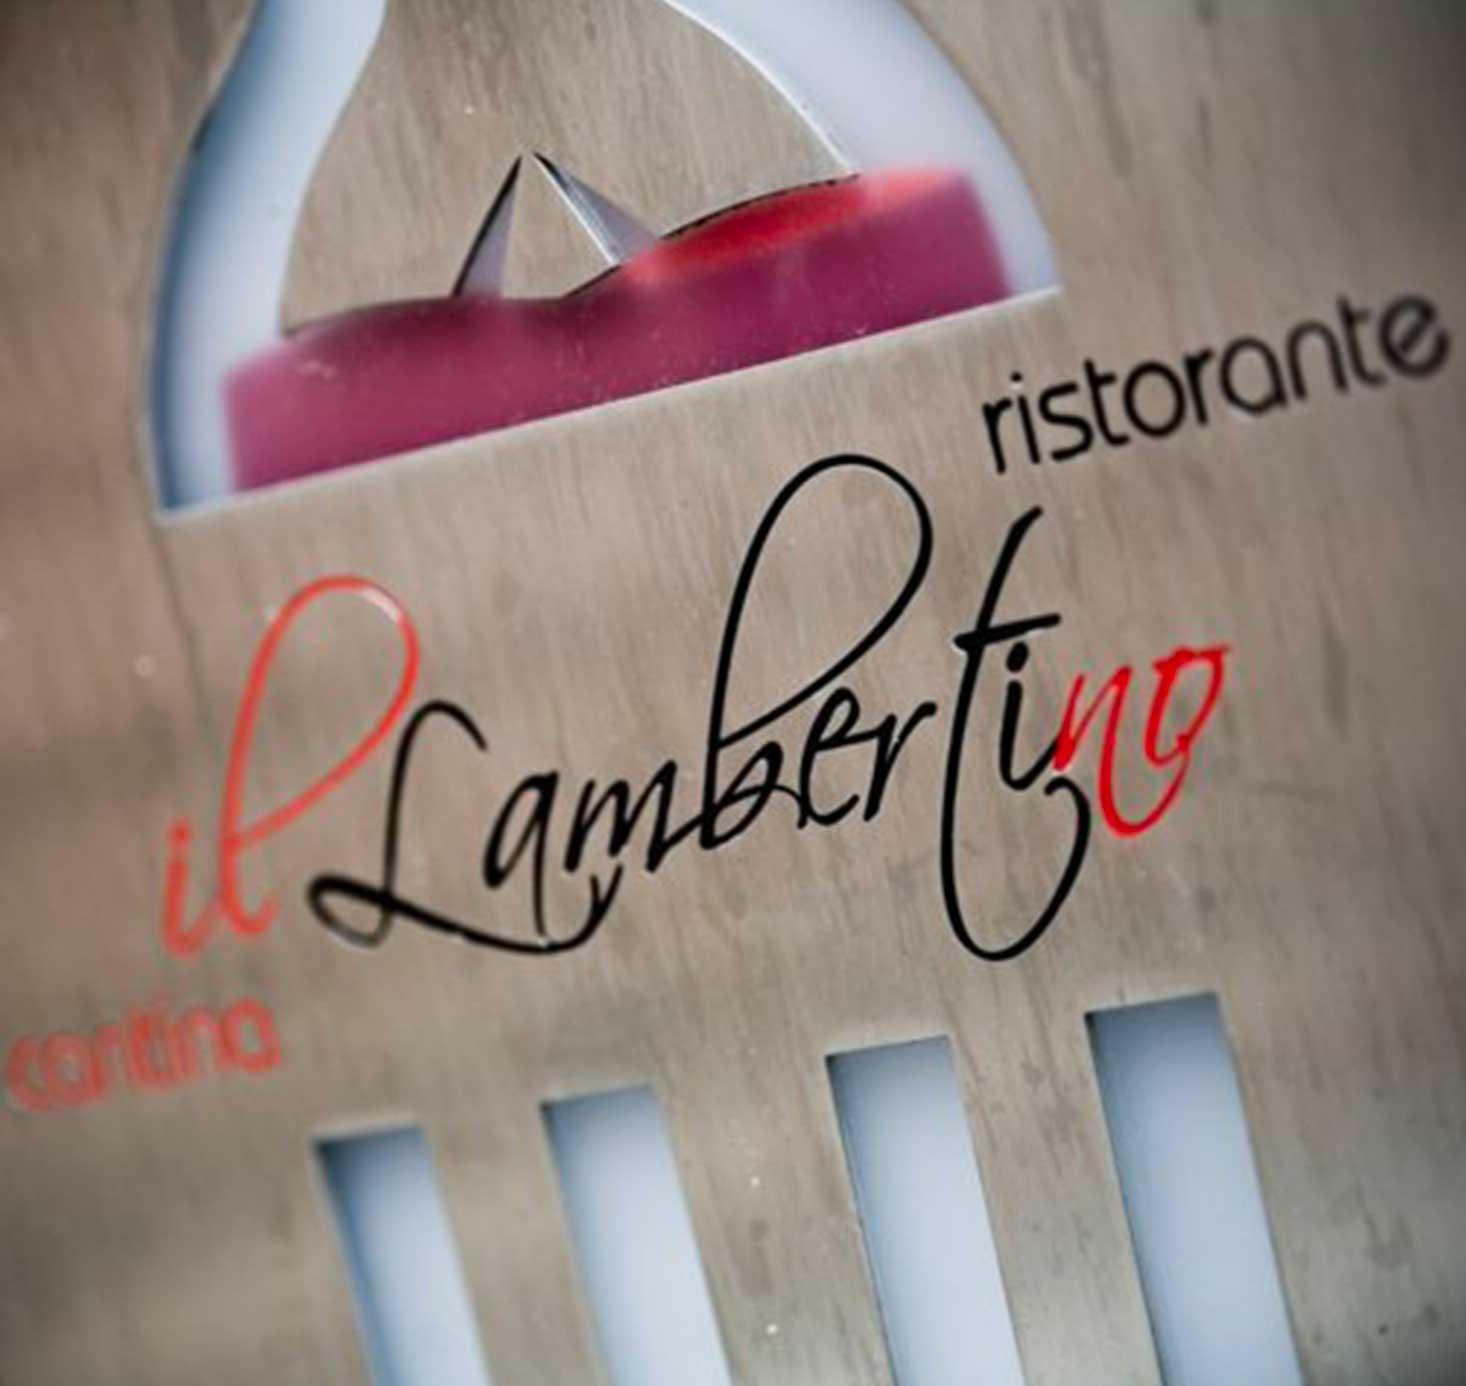 Ristorante Lamberti